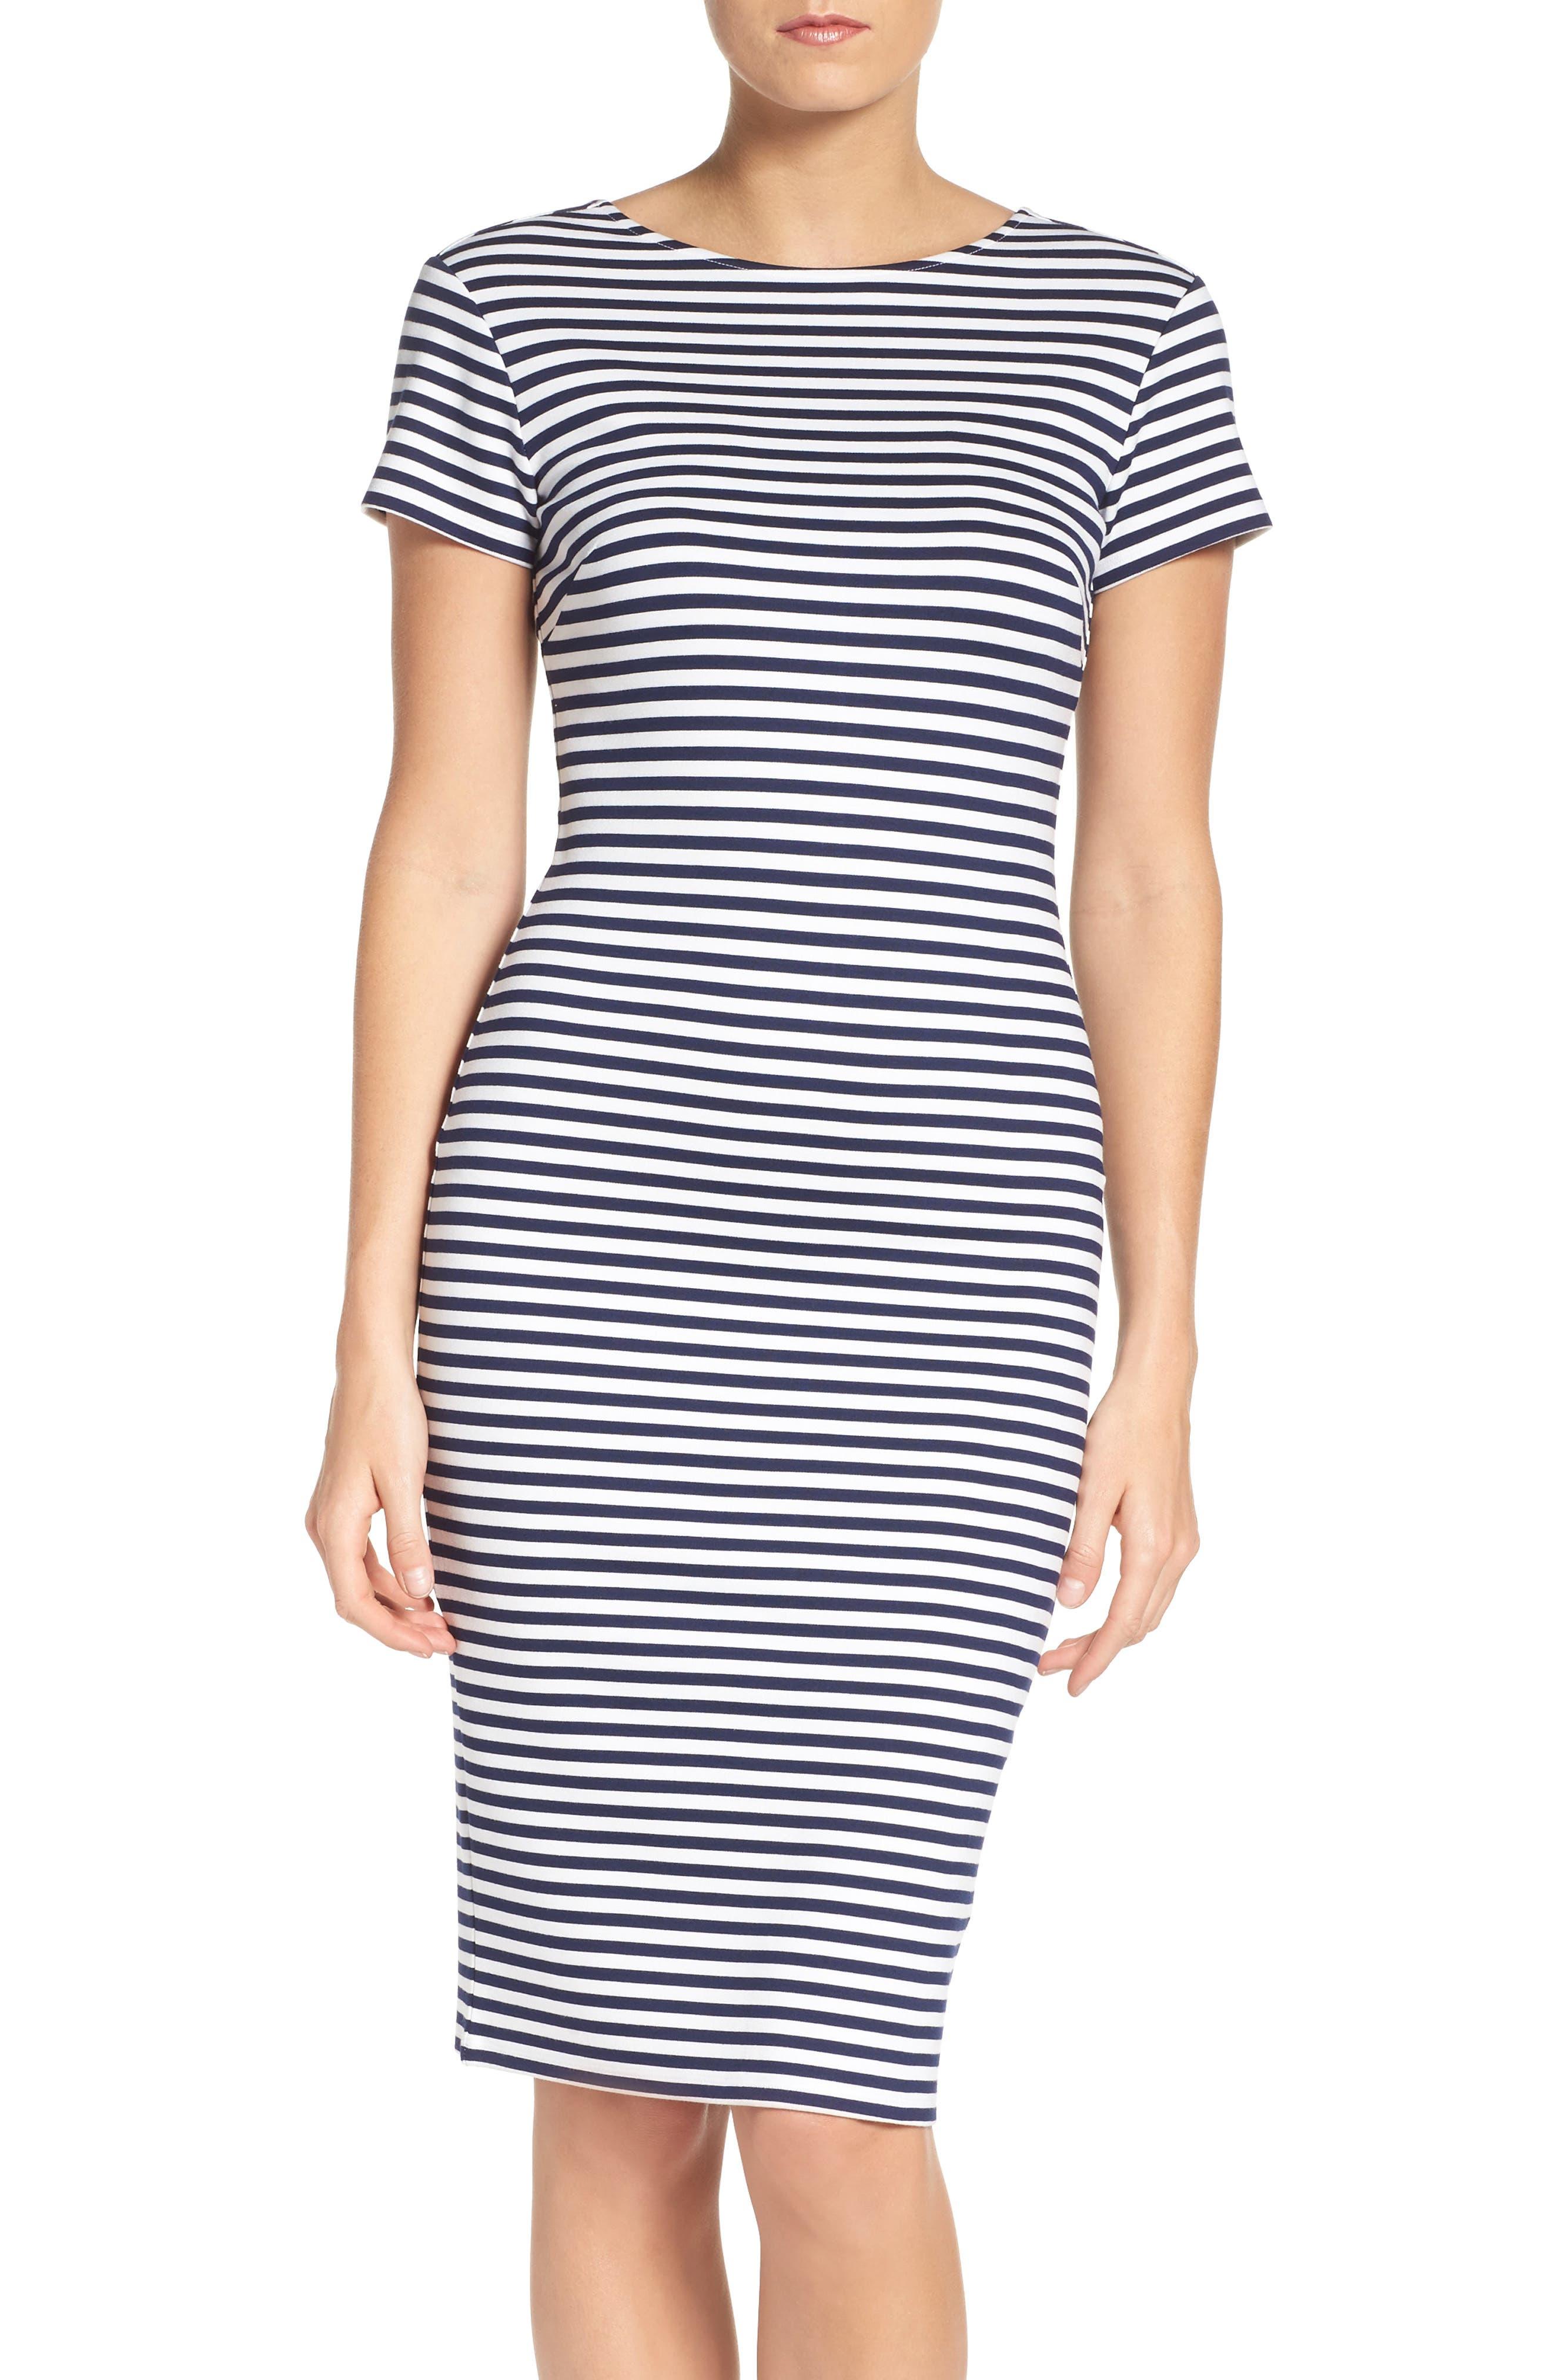 Felicity & Coco Stripe Sheath Dress